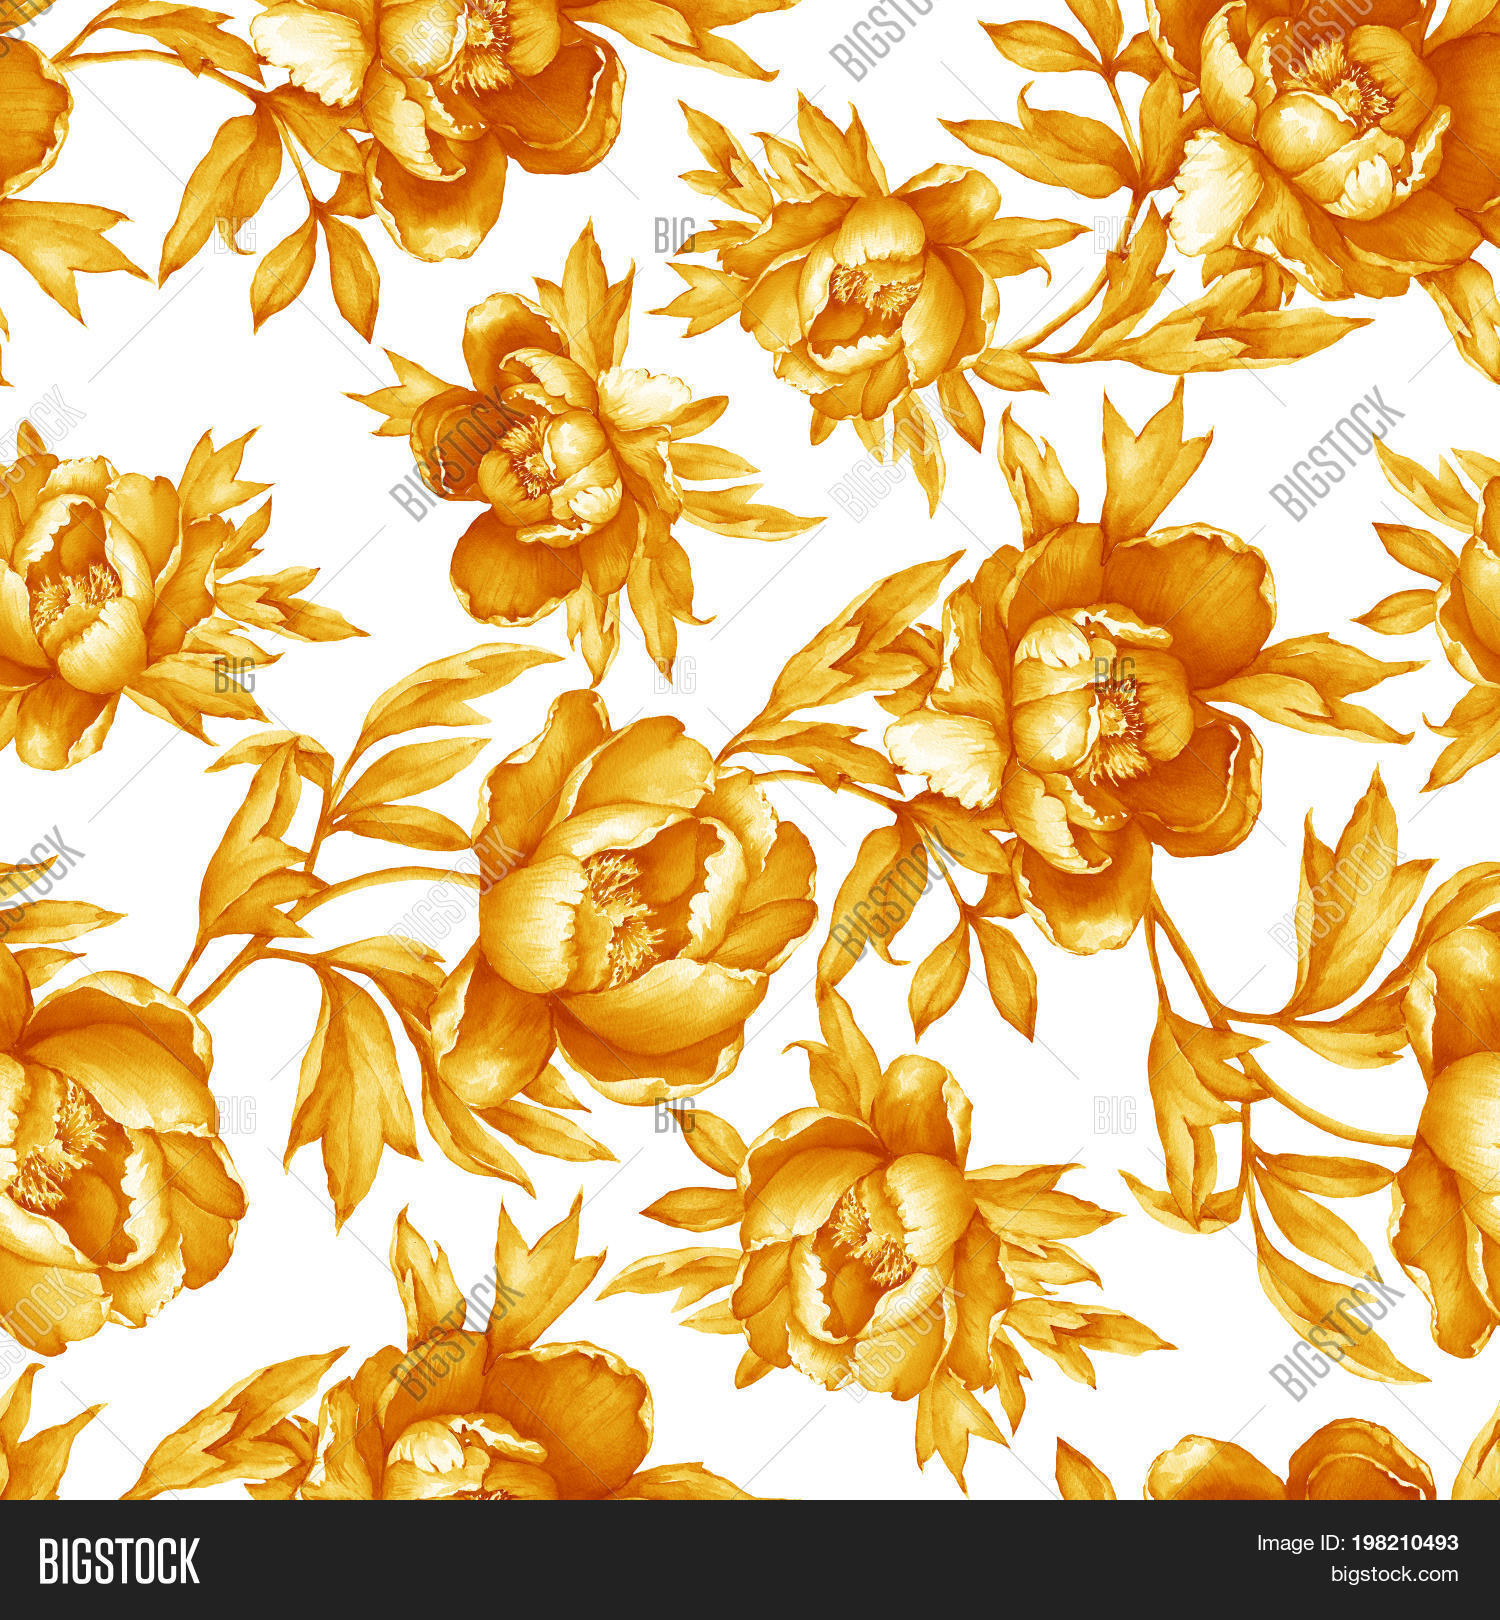 Vintage Floral Image Photo Free Trial Bigstock